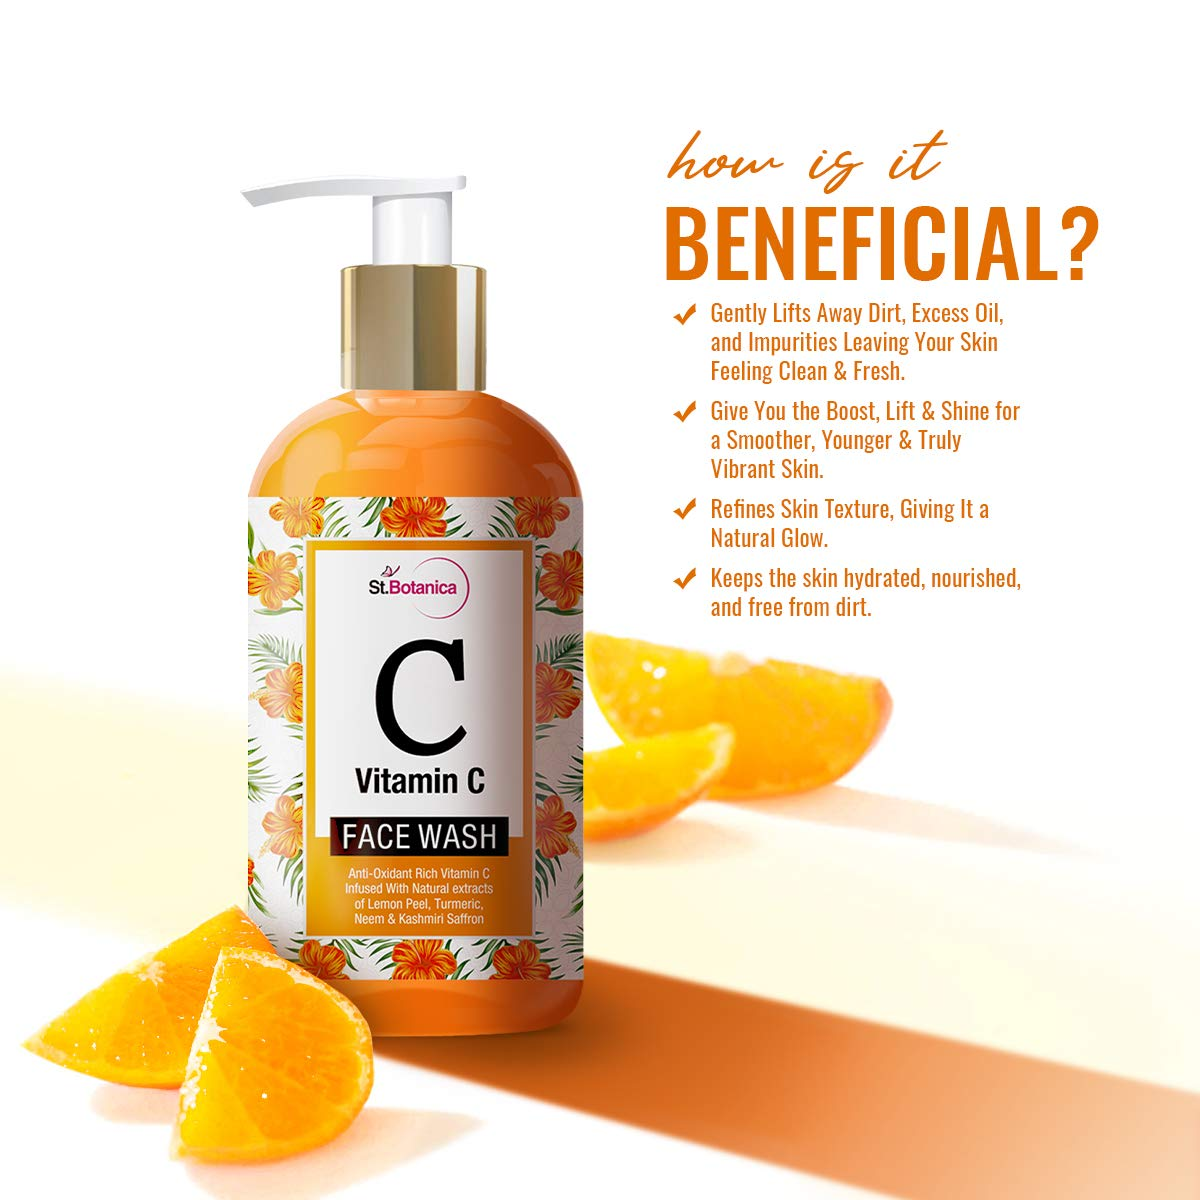 St Botanica Vitamin C Face Wash - With Lemon, Turmeric, Neem and Kashmiri Saffron